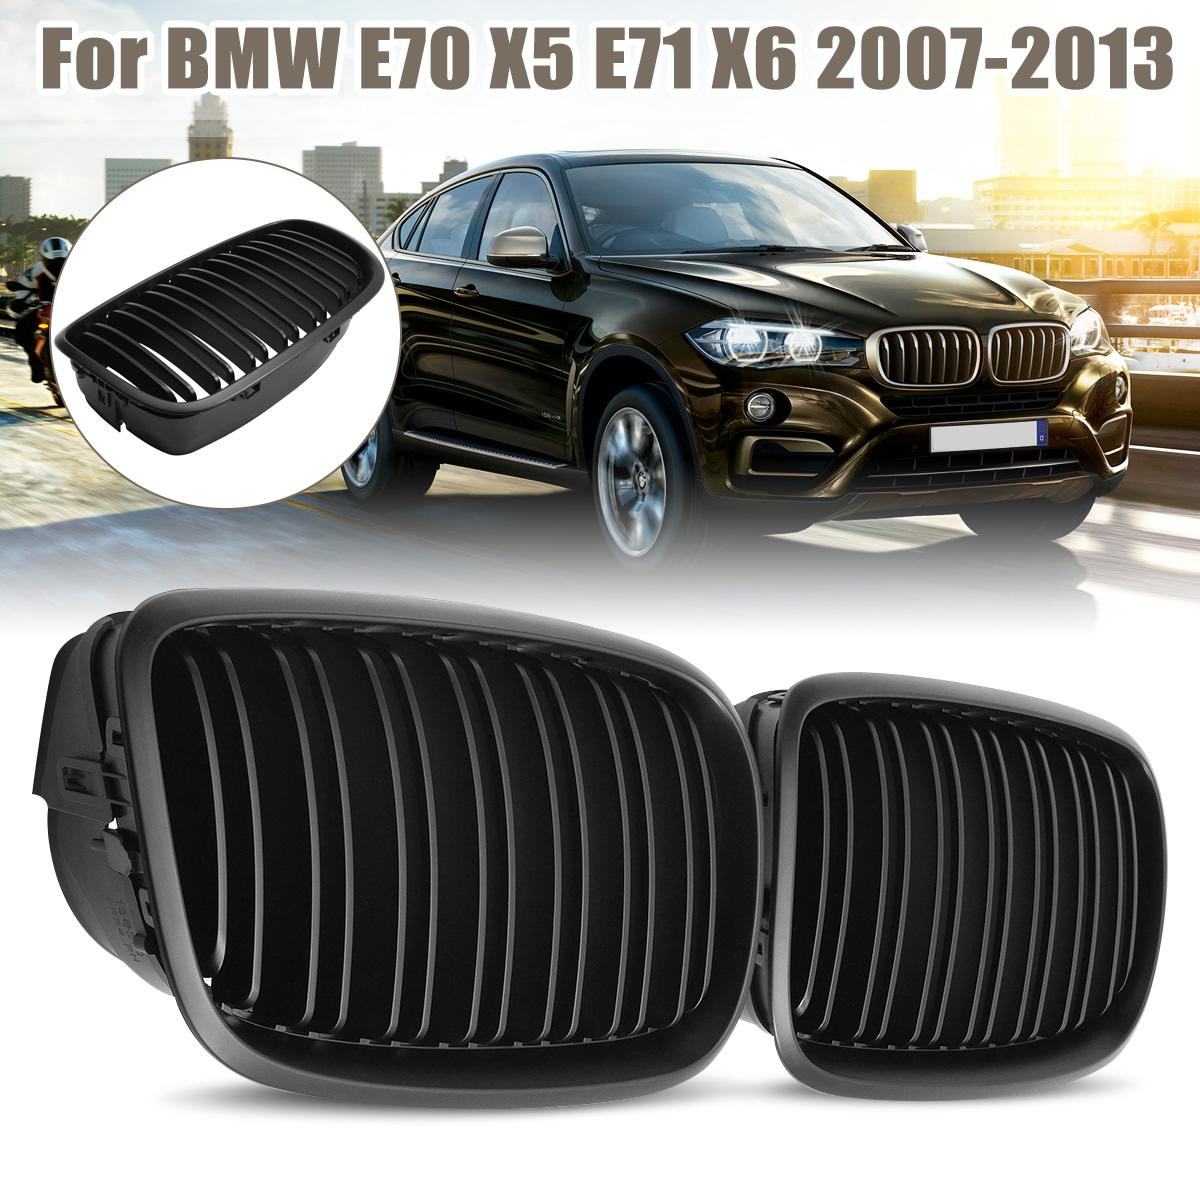 NEW BMW X5 M SERIES E70 2011-2013 REAR BUMPER TRIM DECOR COVER PAIR SET